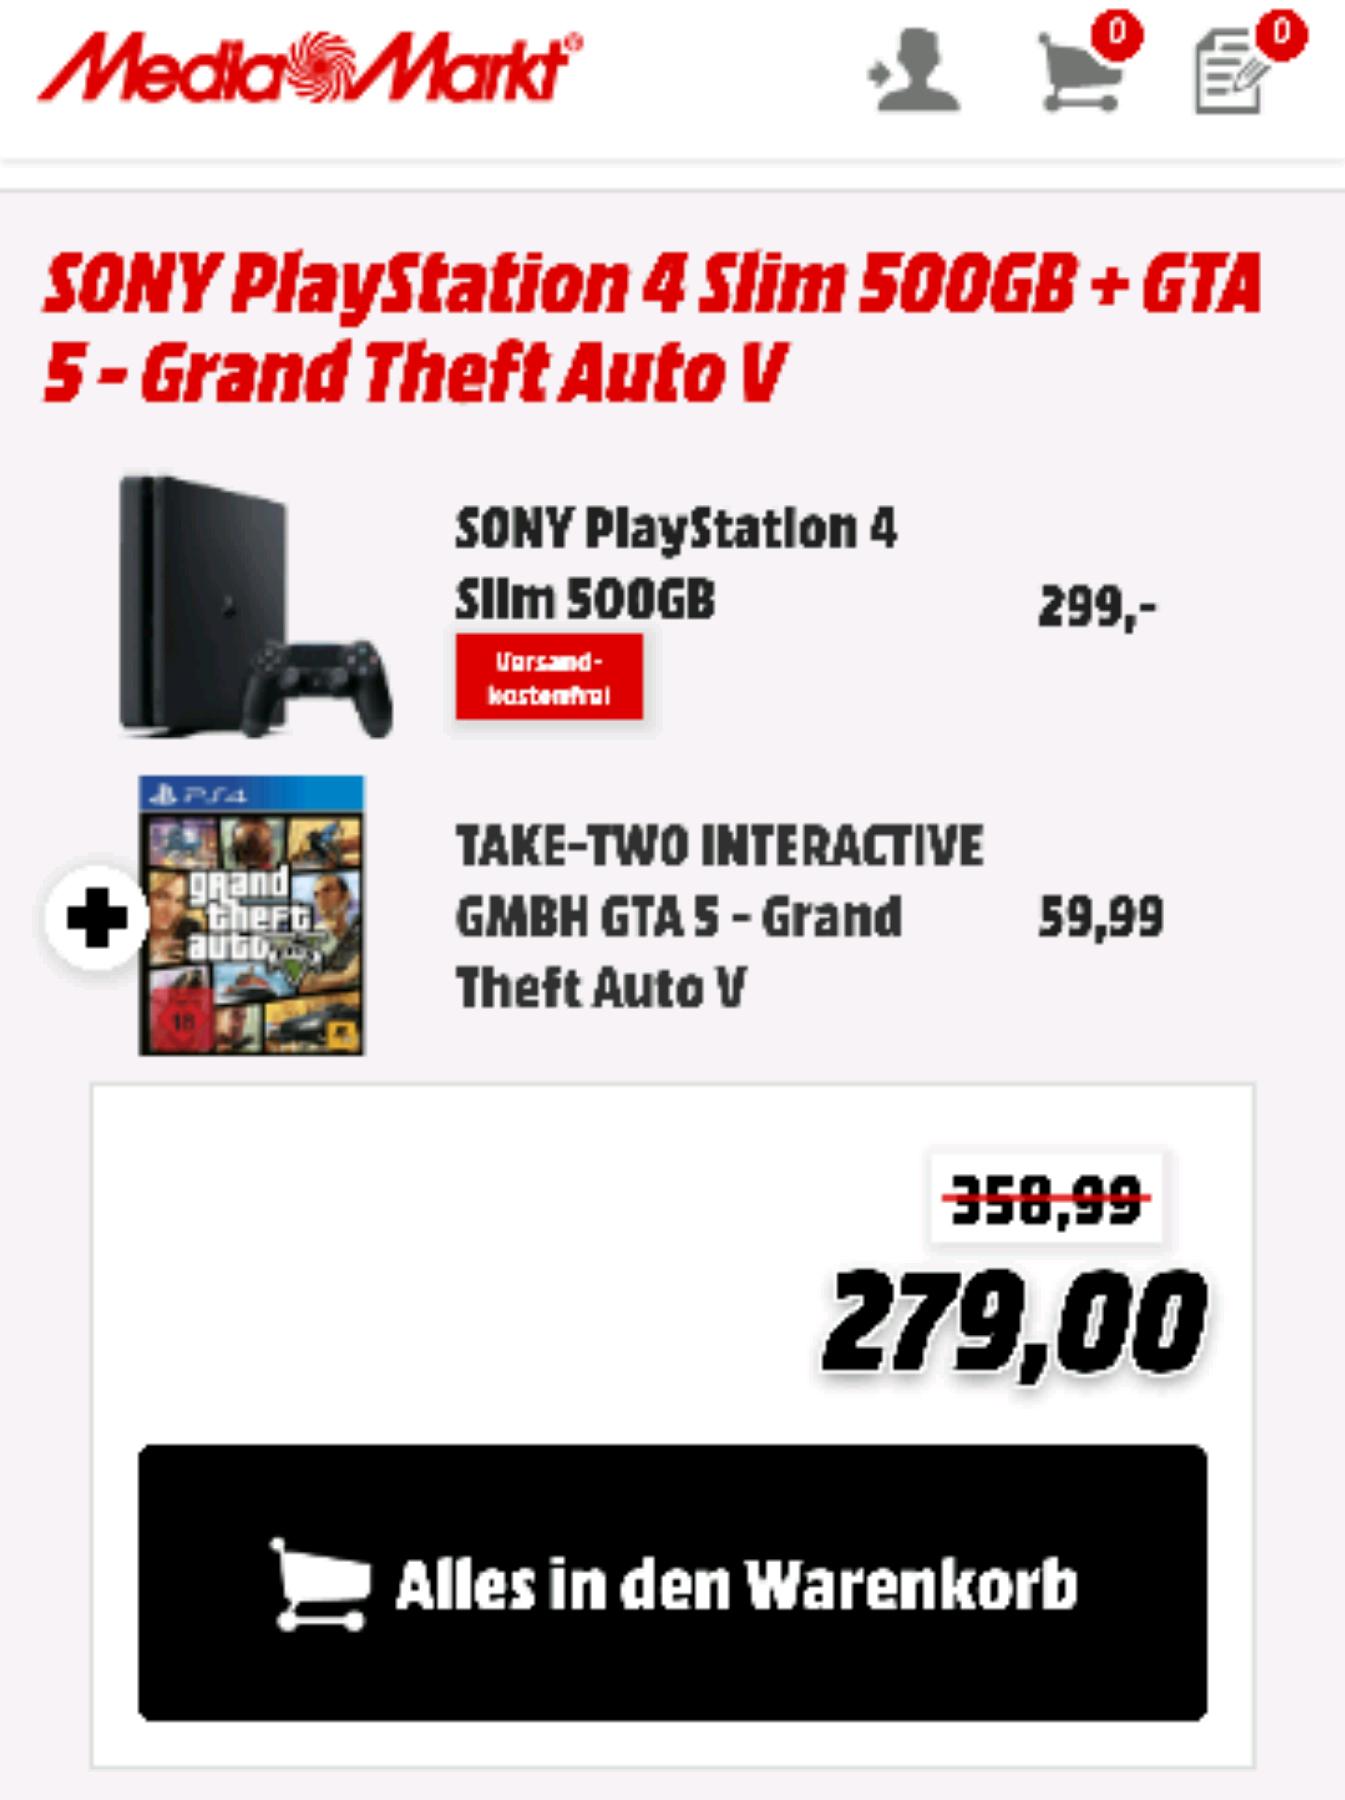 Sony PlayStation 4 Slim + GTA 5 Supergünstig